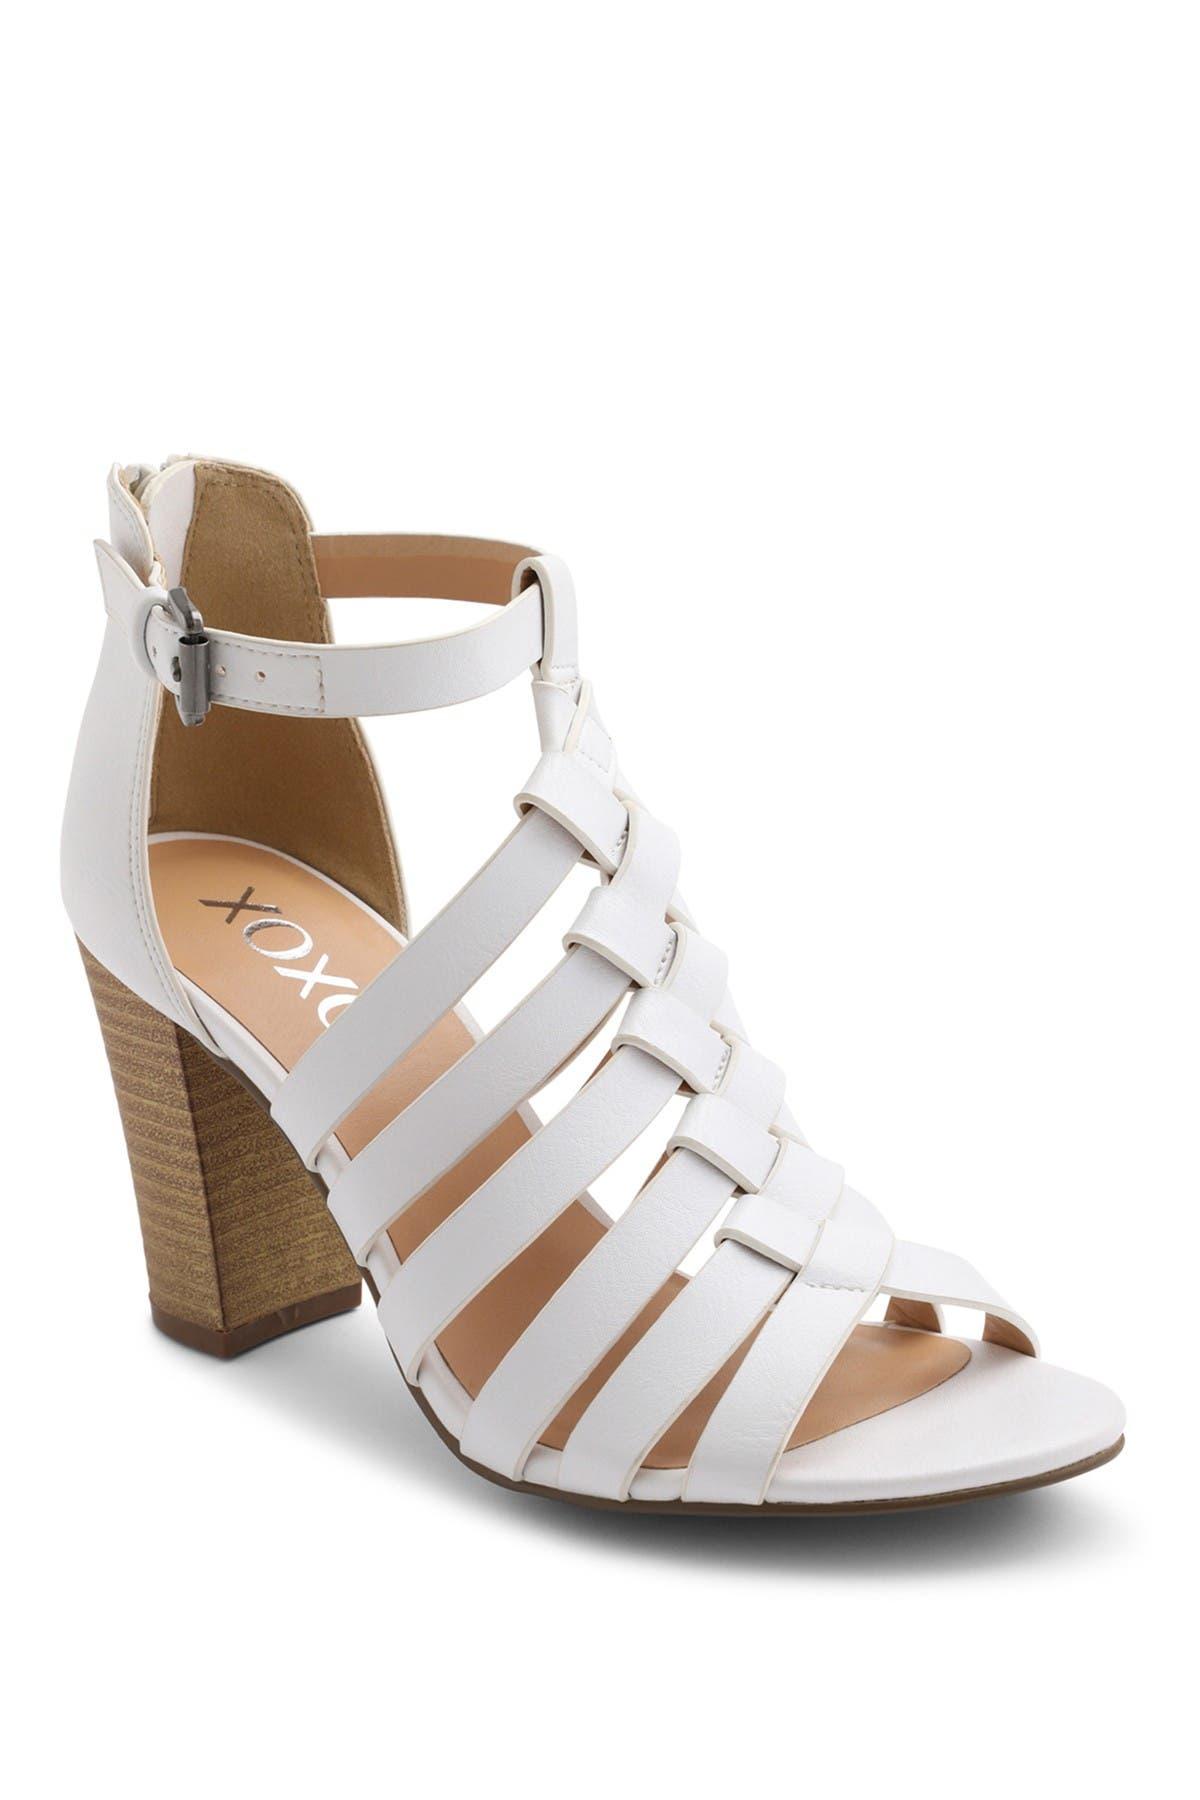 XOXO   Baxter Strappy Block Heel Sandal